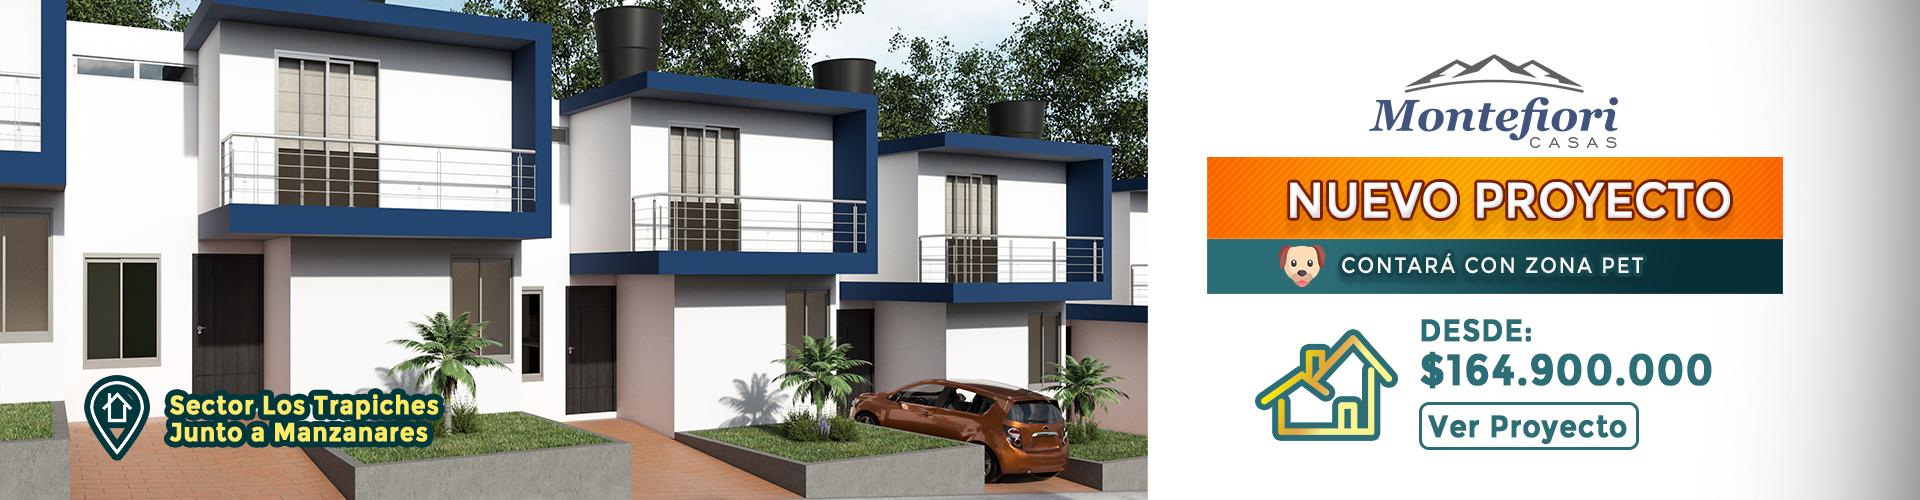 Constructora Monape Casas Montefiore